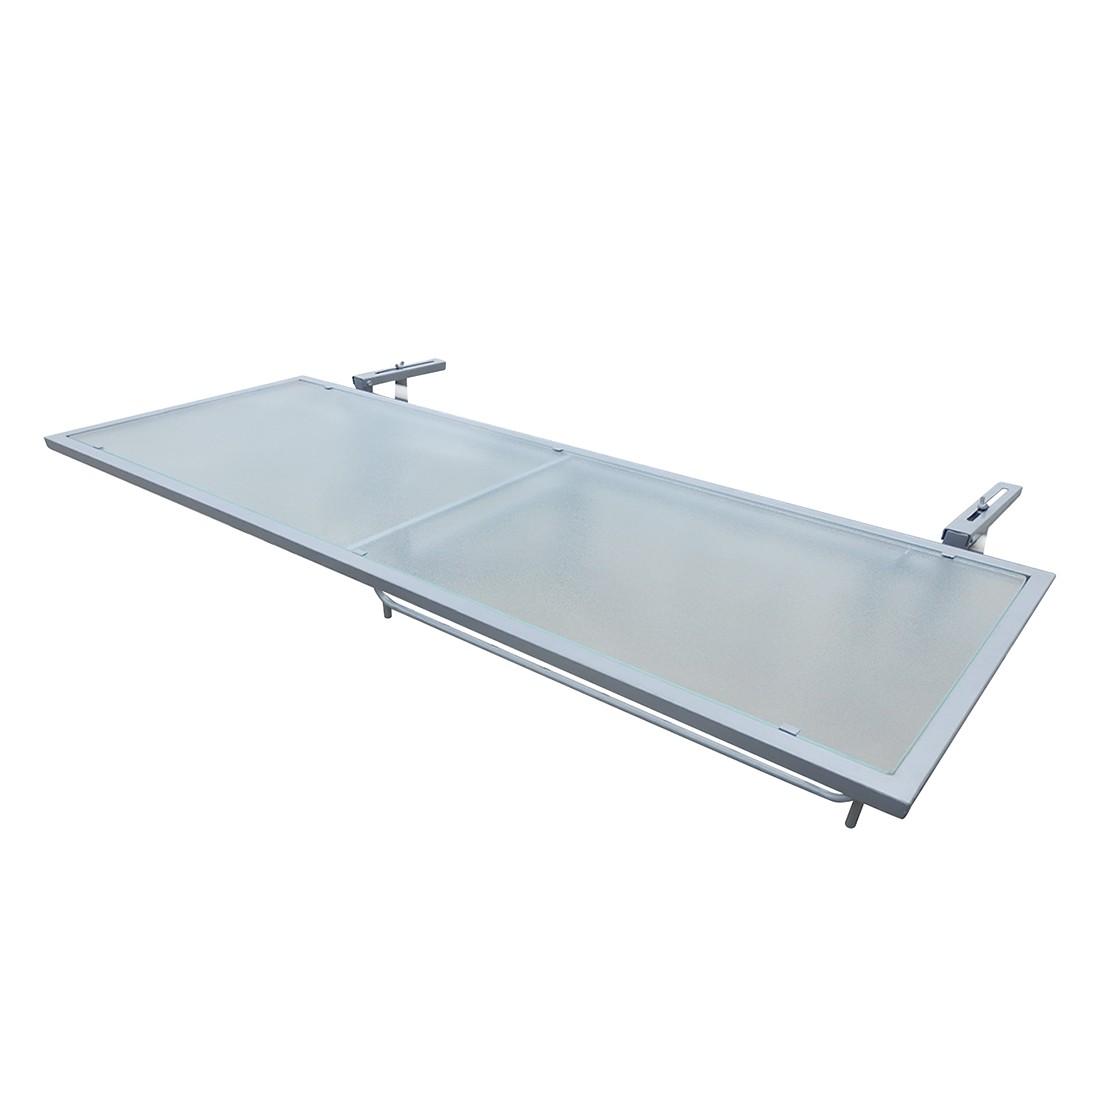 Balkon klaptafel Opal II - staal/glas, Merxx